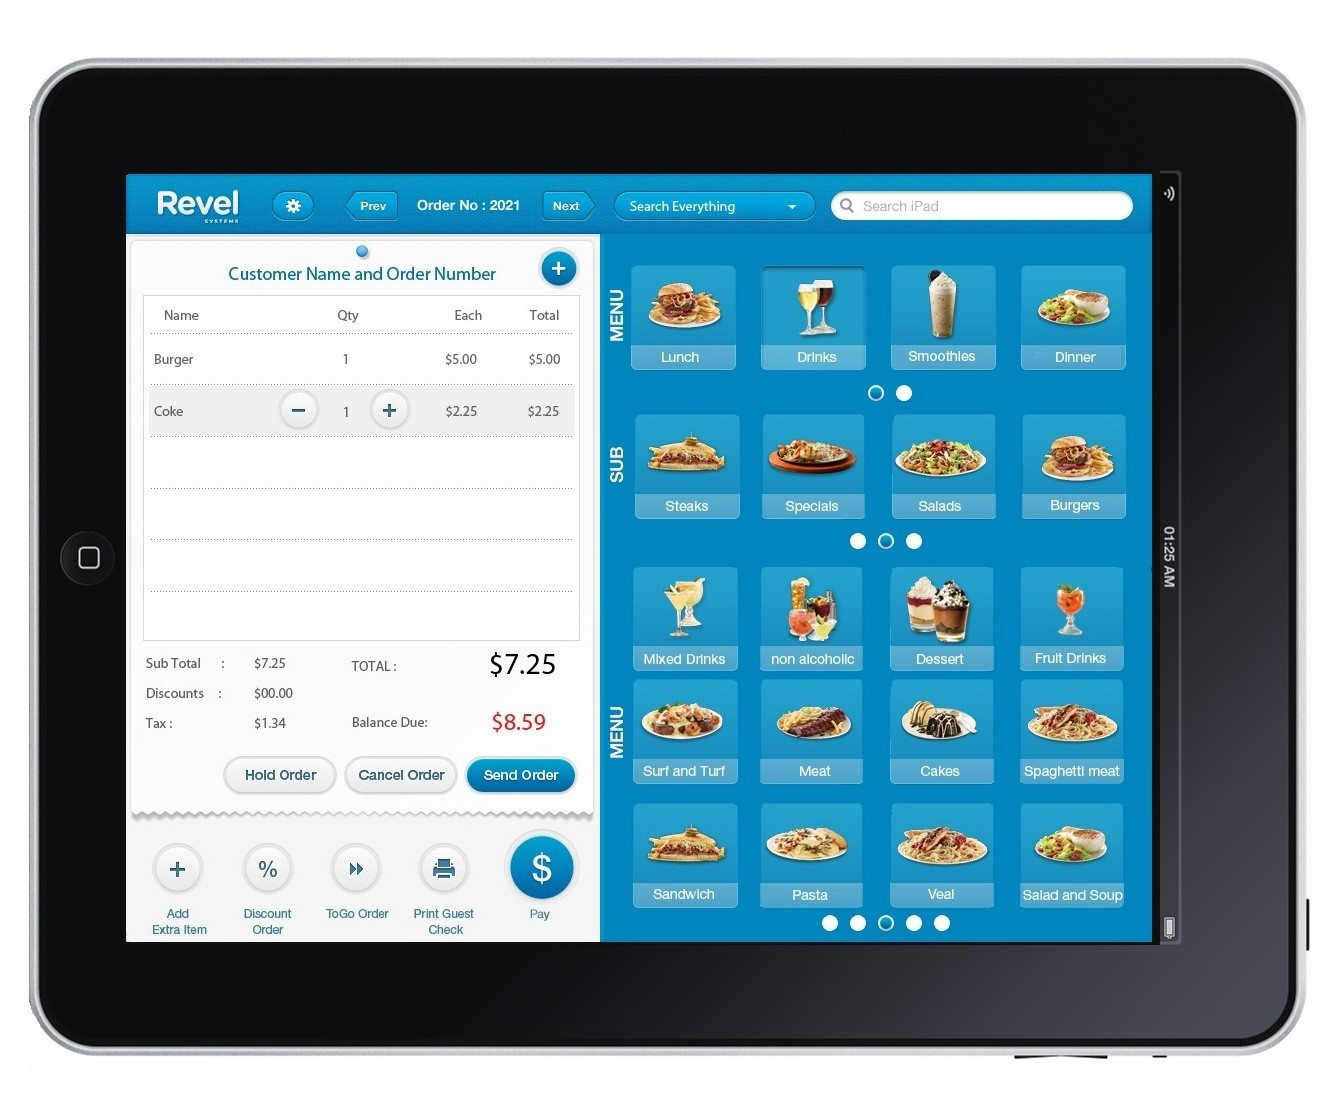 revel-systems-ipad-order-screenshot